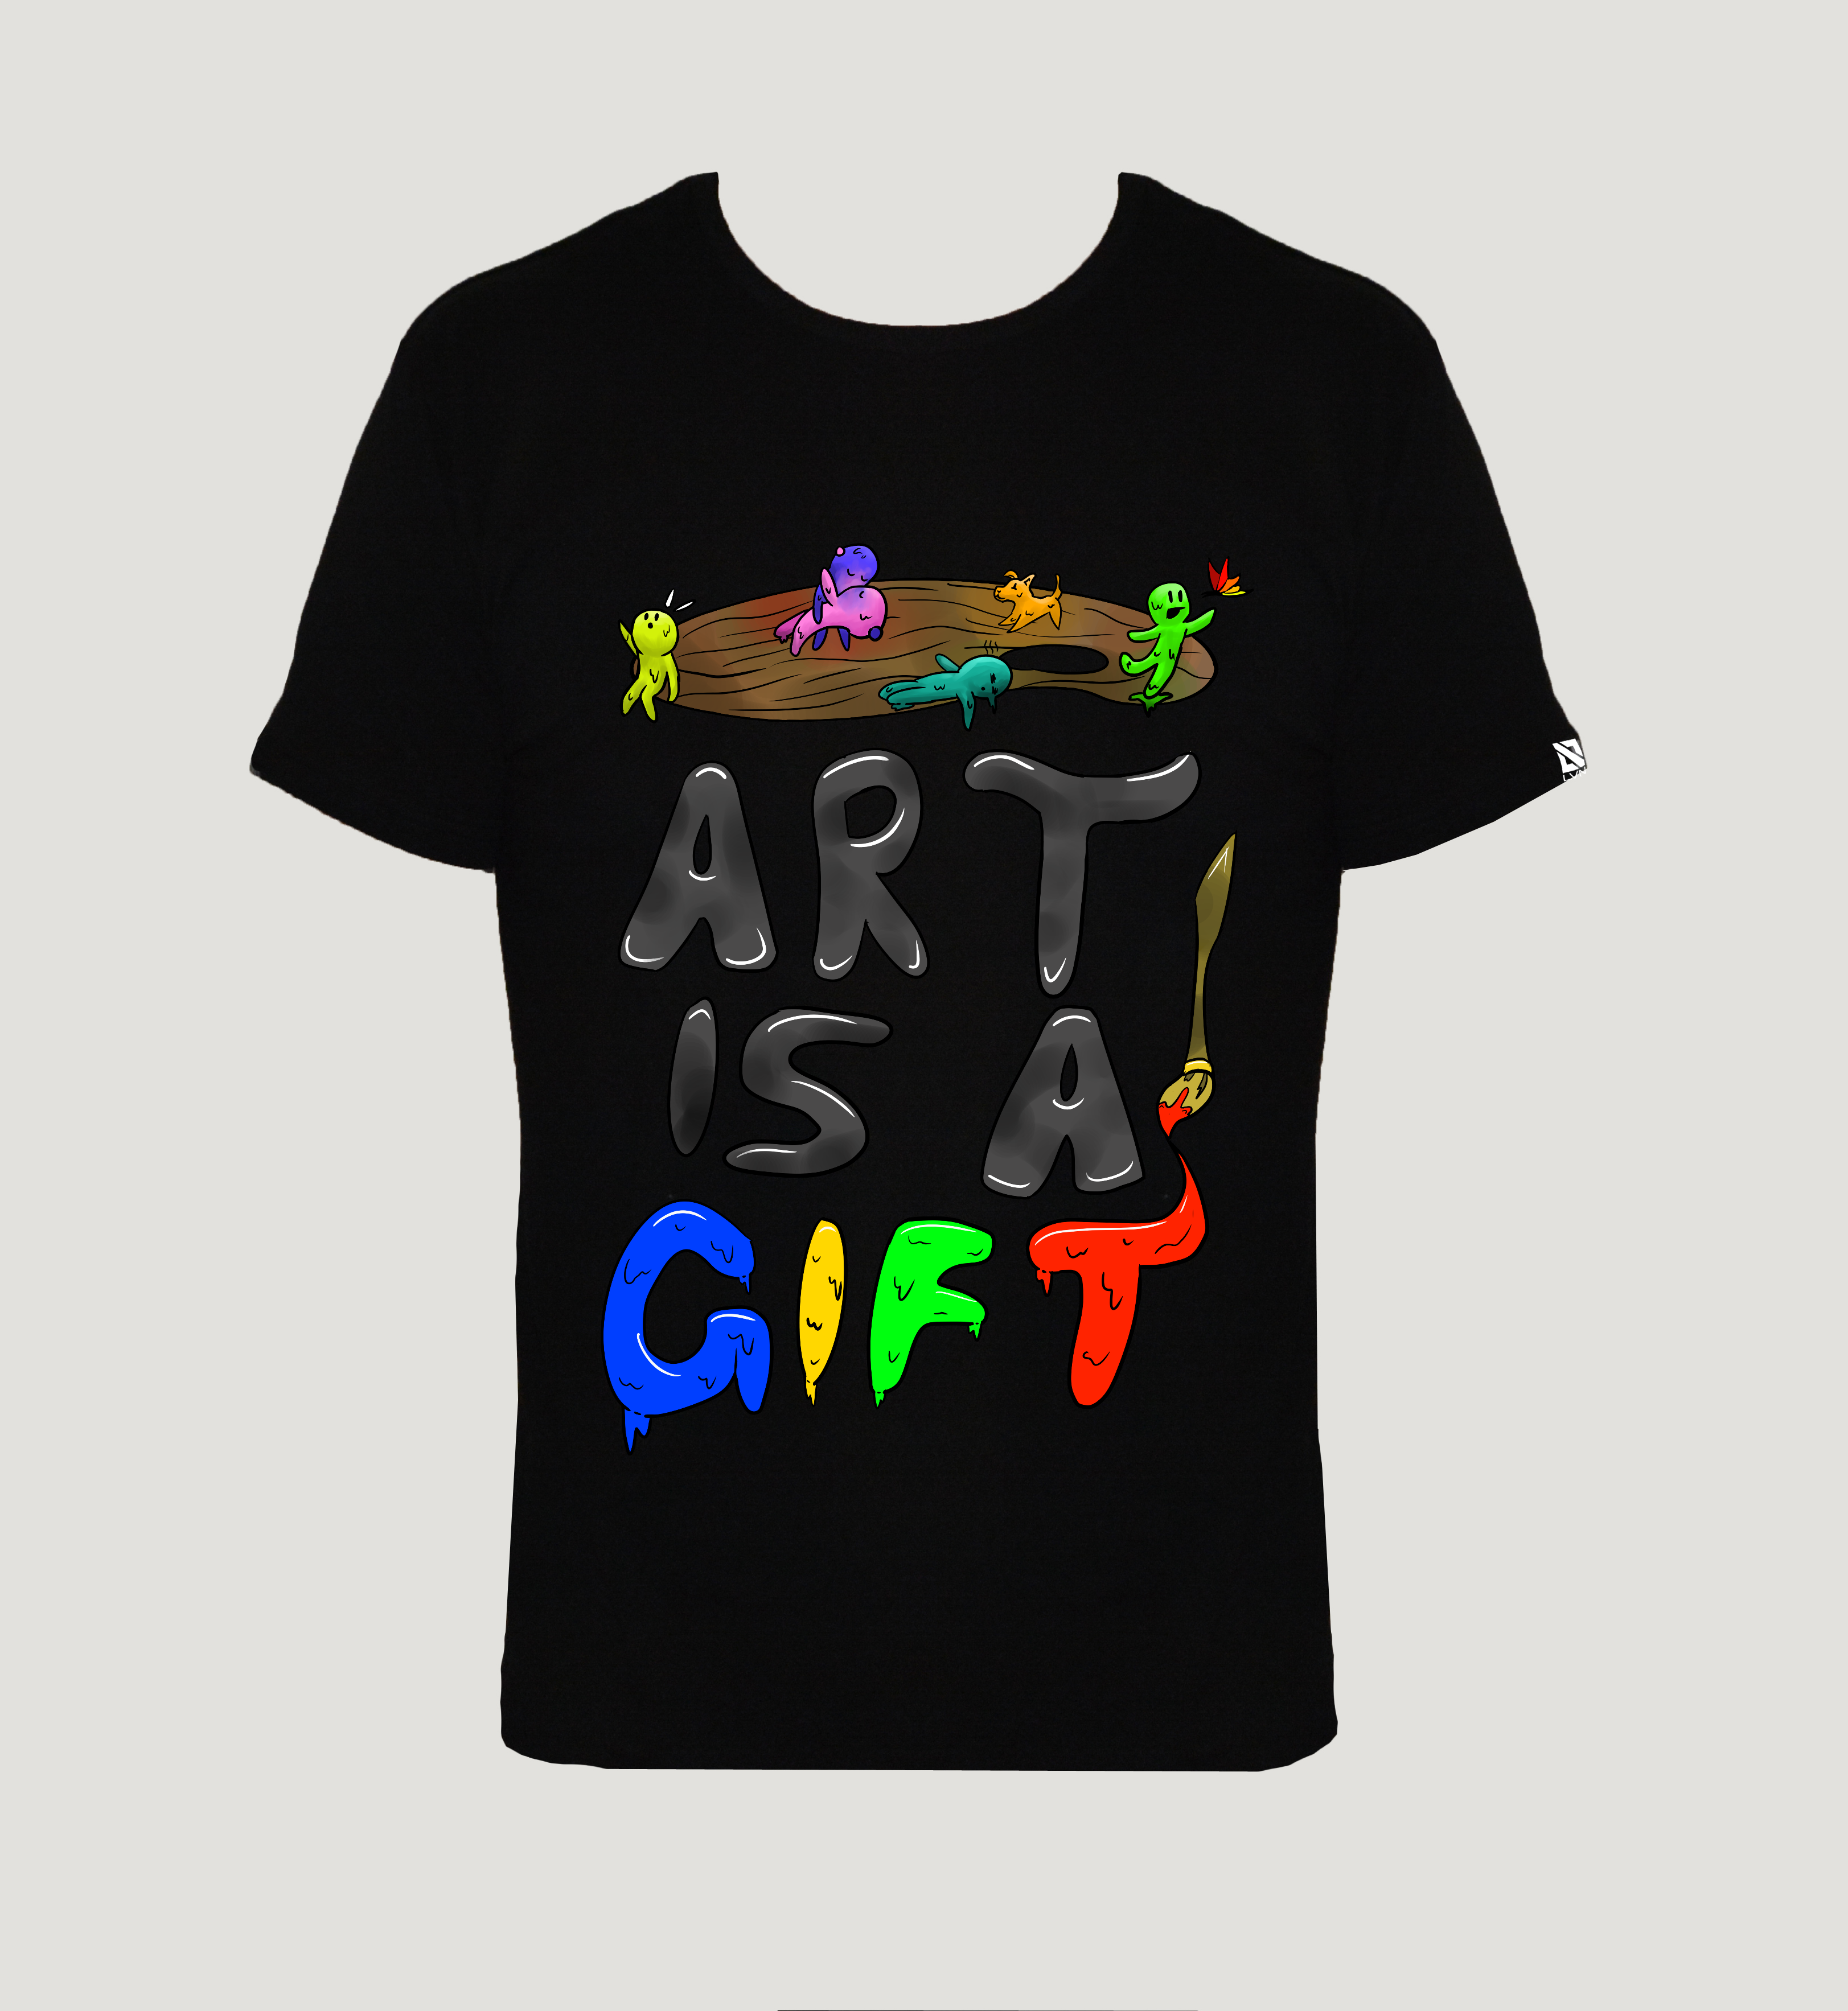 Shirt design 2/3